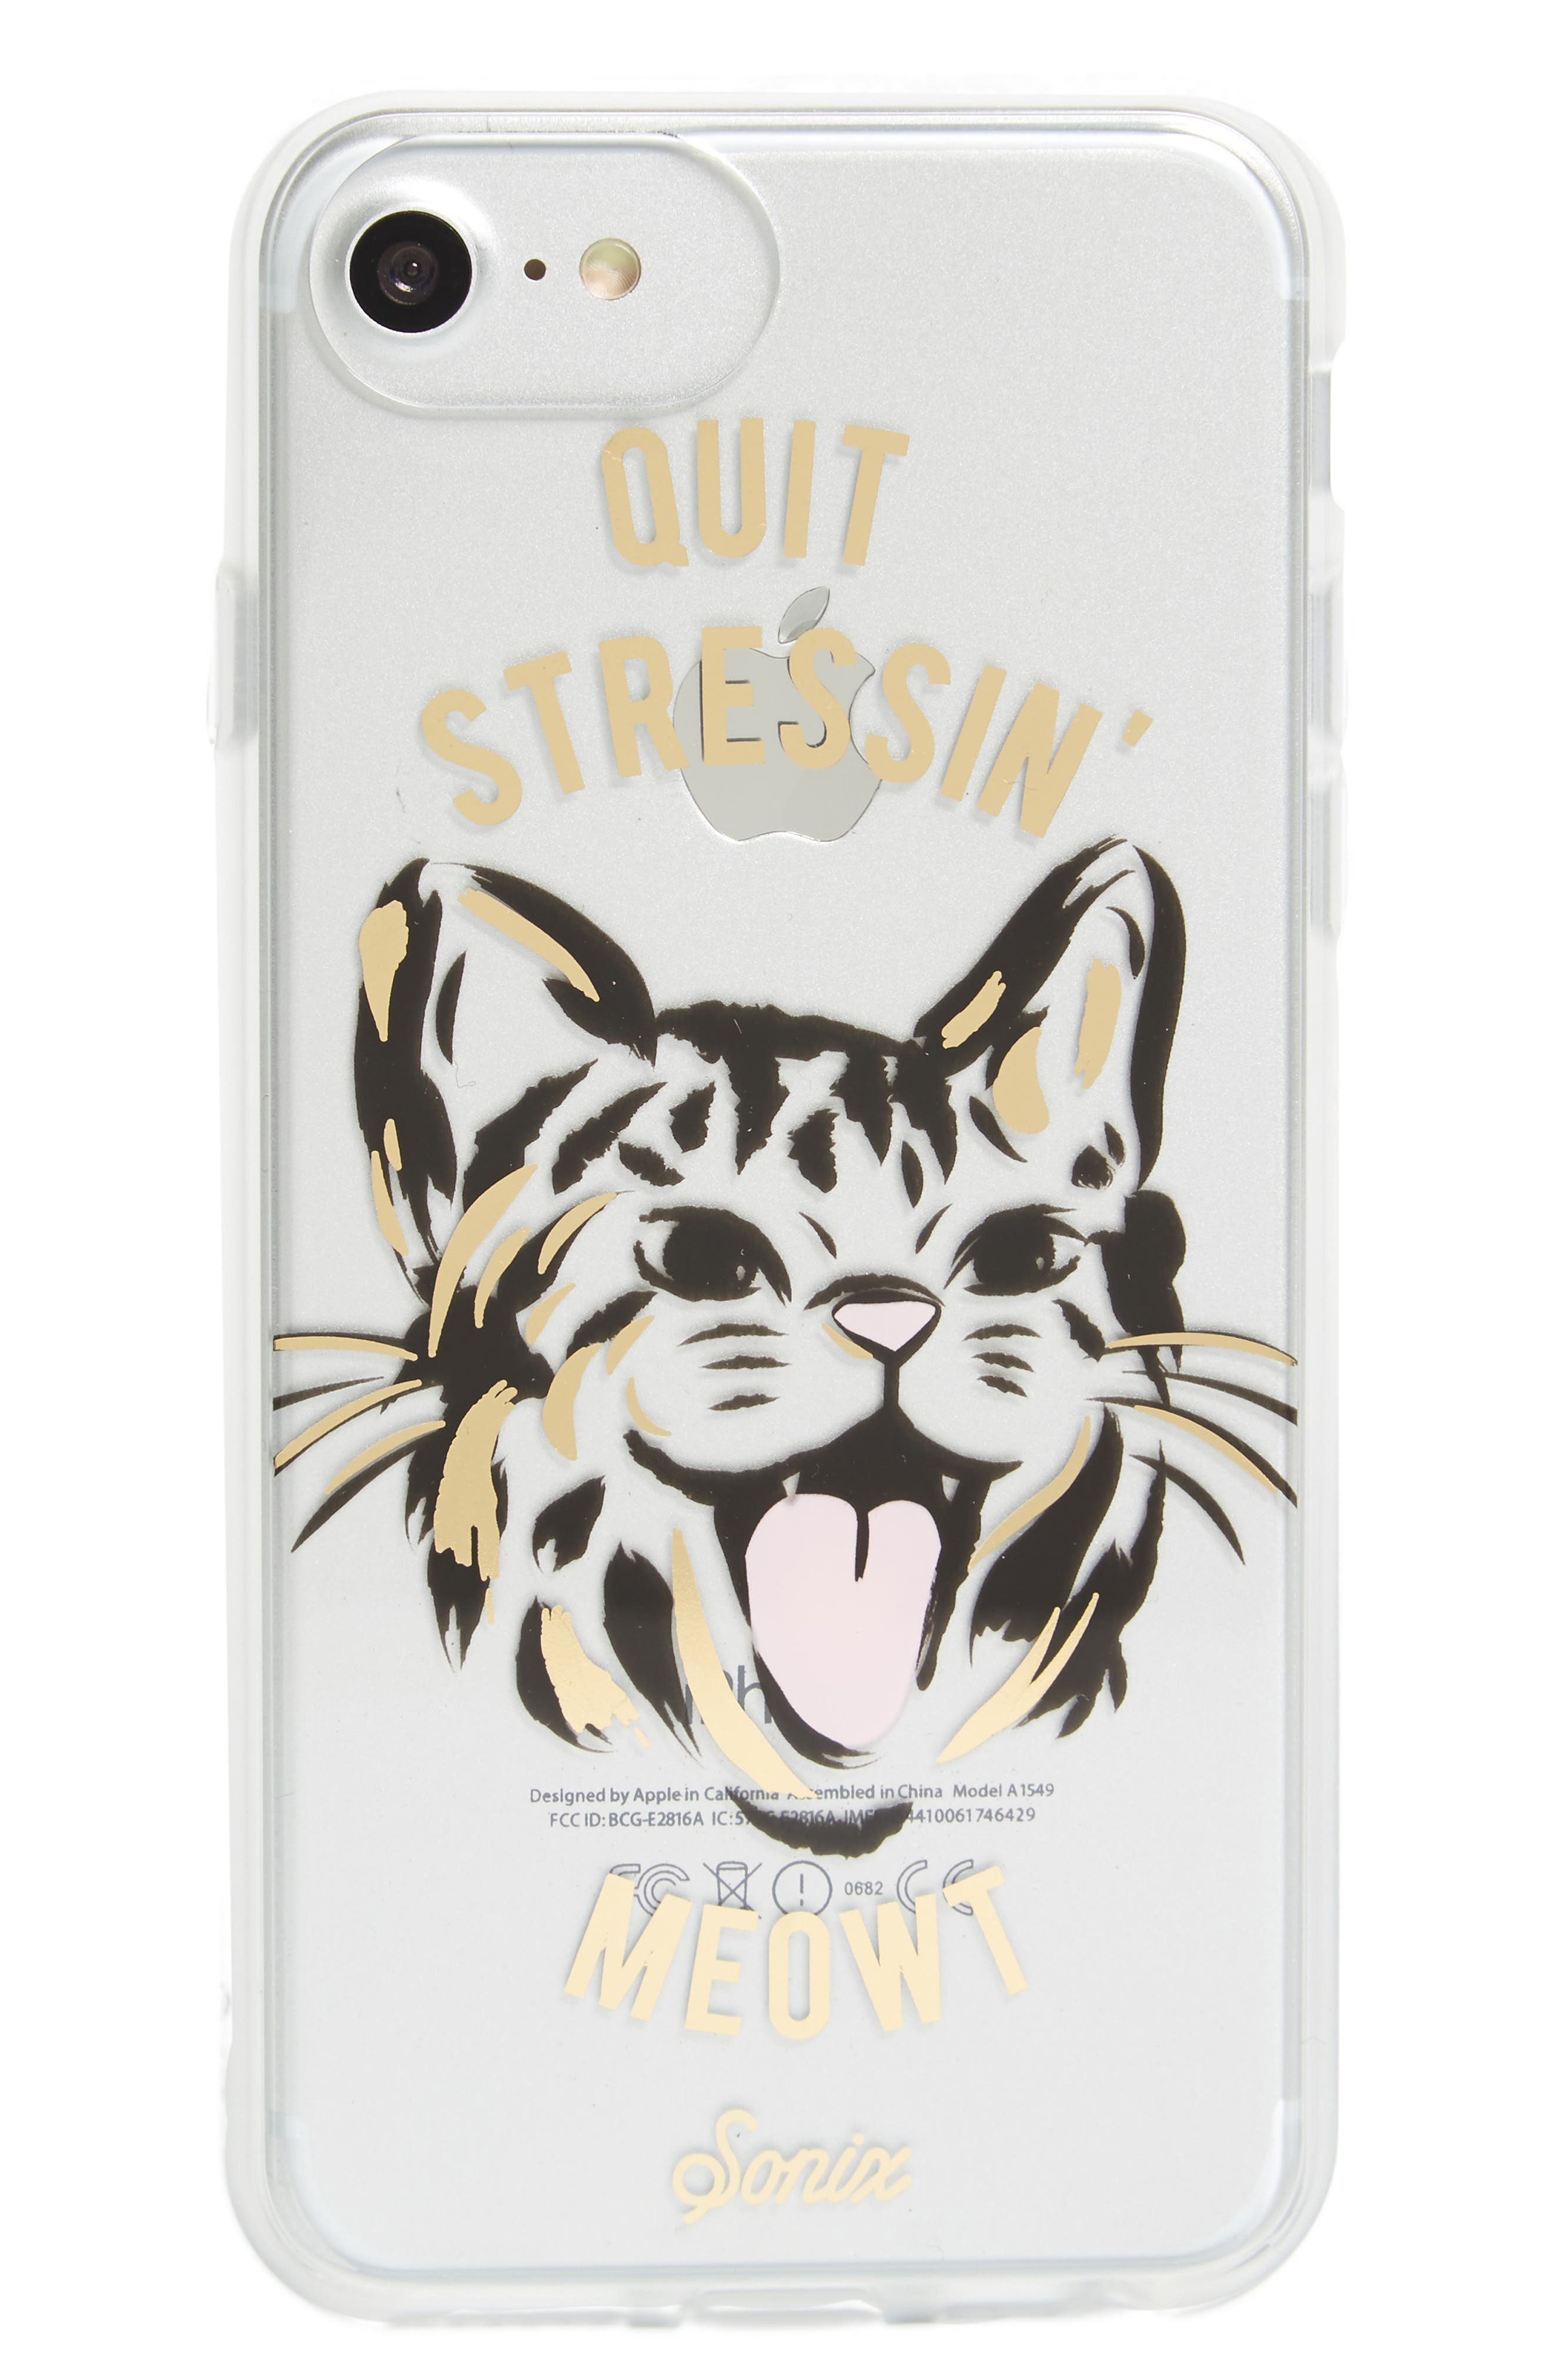 Quit Stressin' Meowt iPhone 6/6s/7/8 & 6/6s/7/8 Plus Case,                         Main,                         color, 710